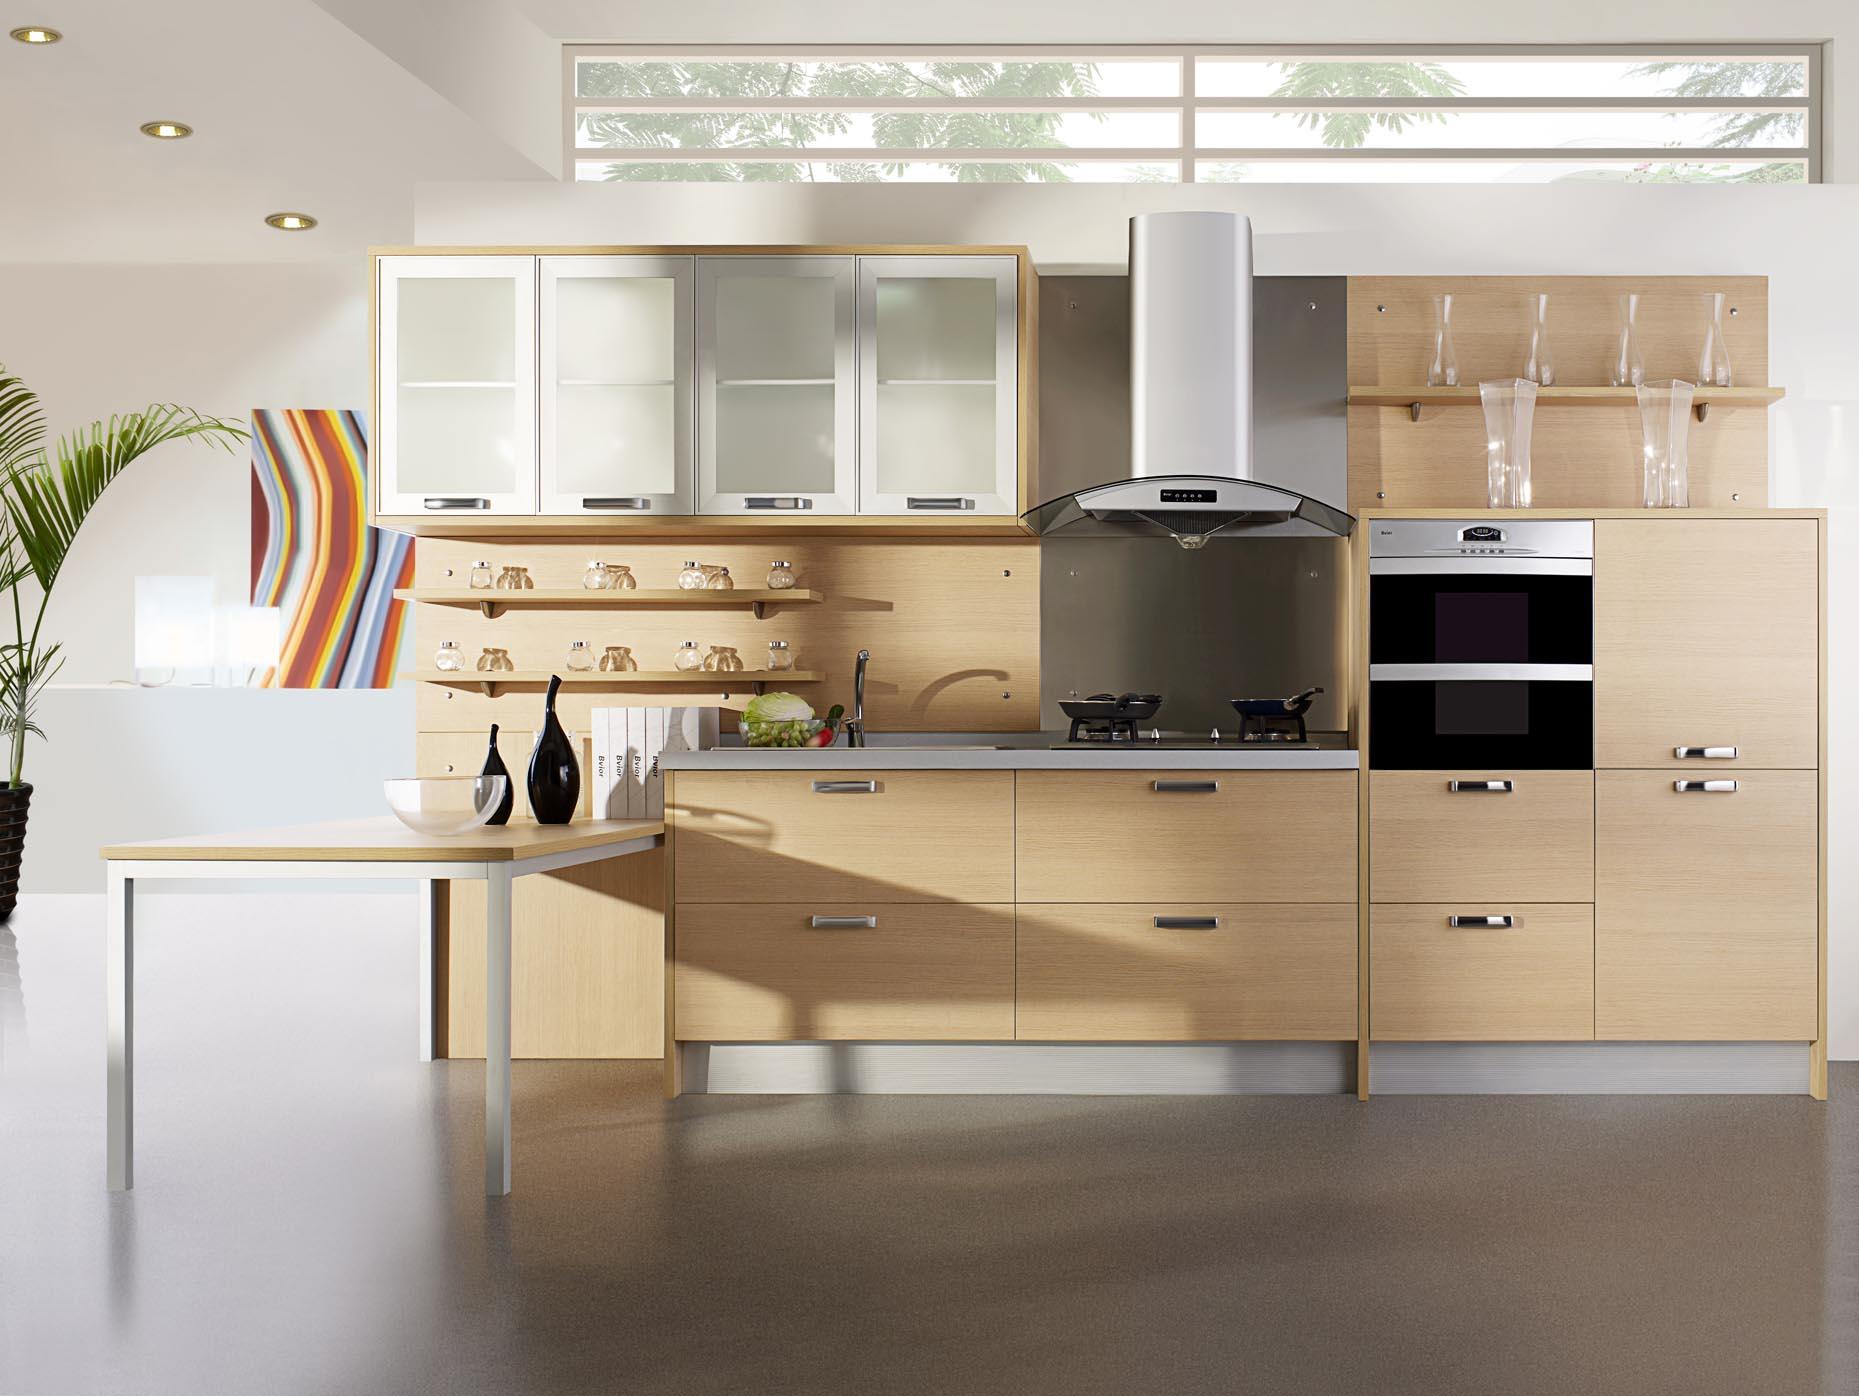 White kitchen wall cabinets Photo - 7